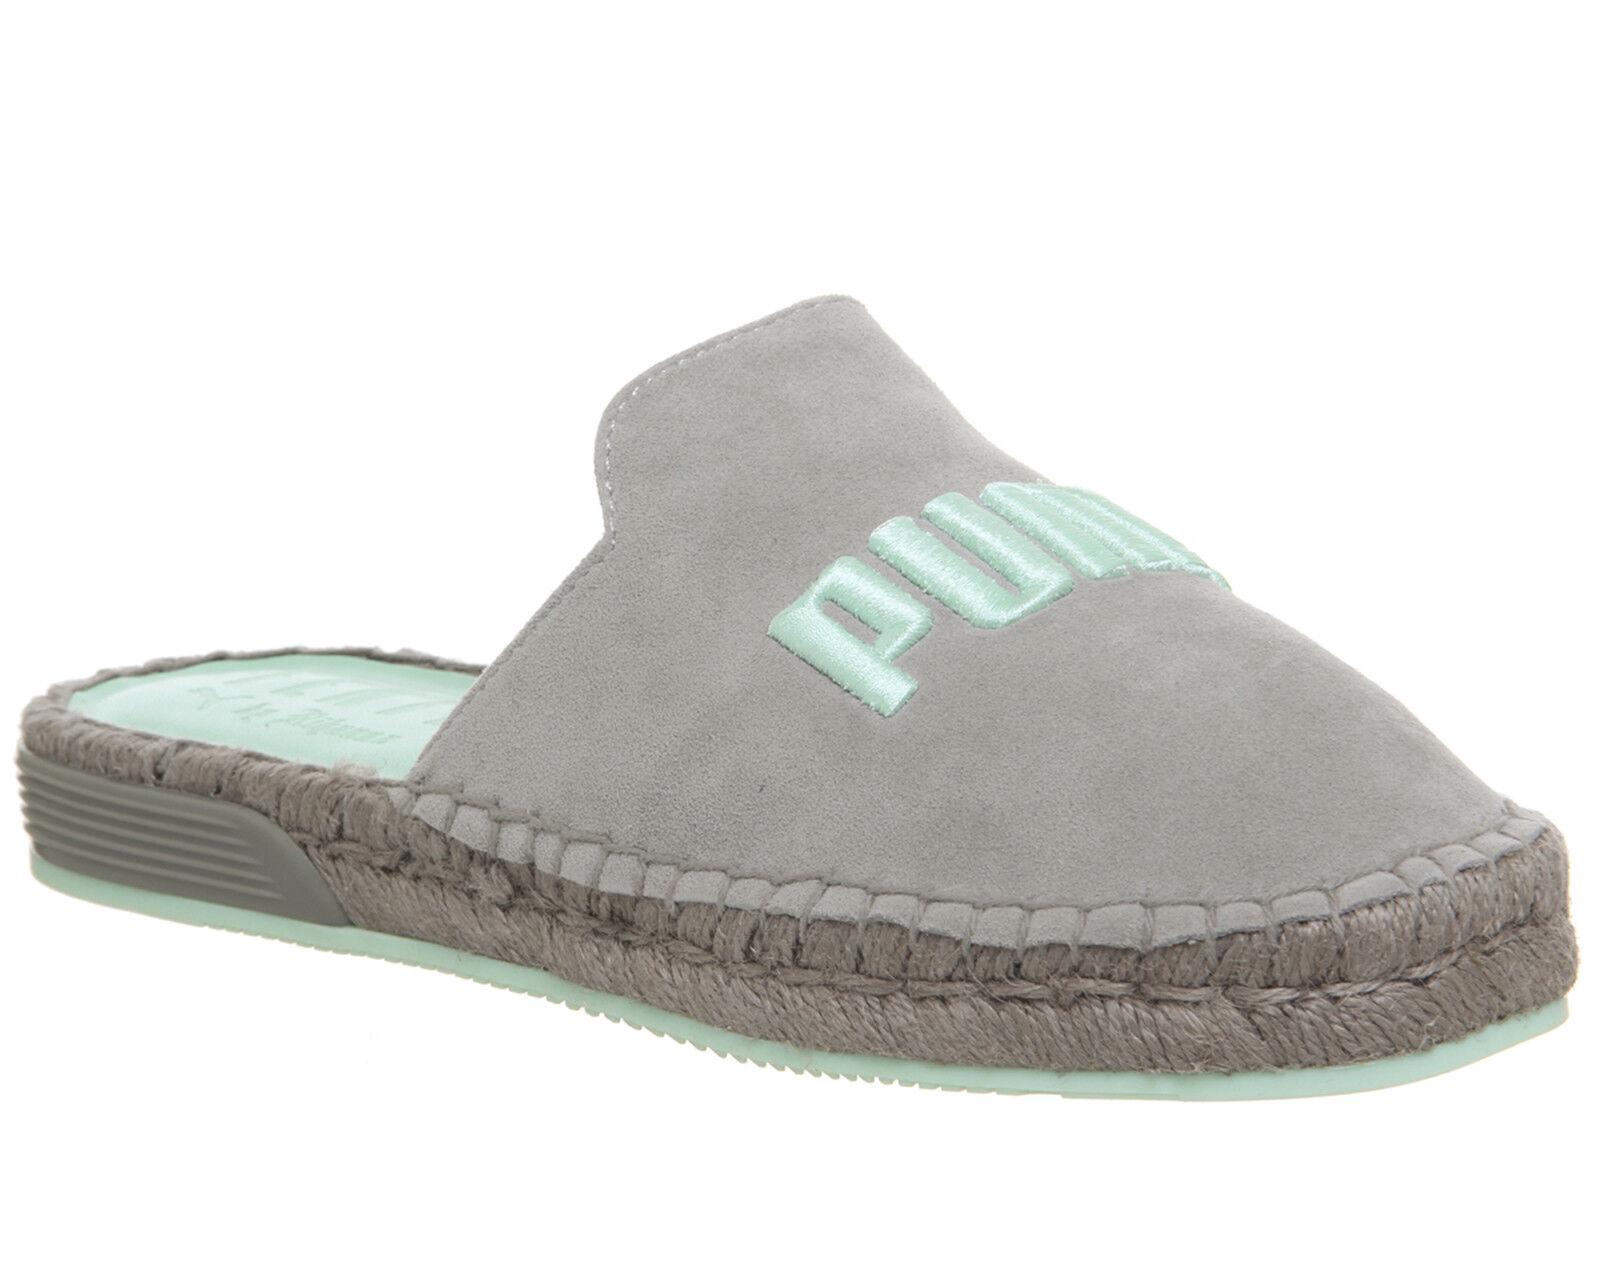 femmes Puma Fenty Espadrilles DRIZZLE BAY Trainers Chaussures